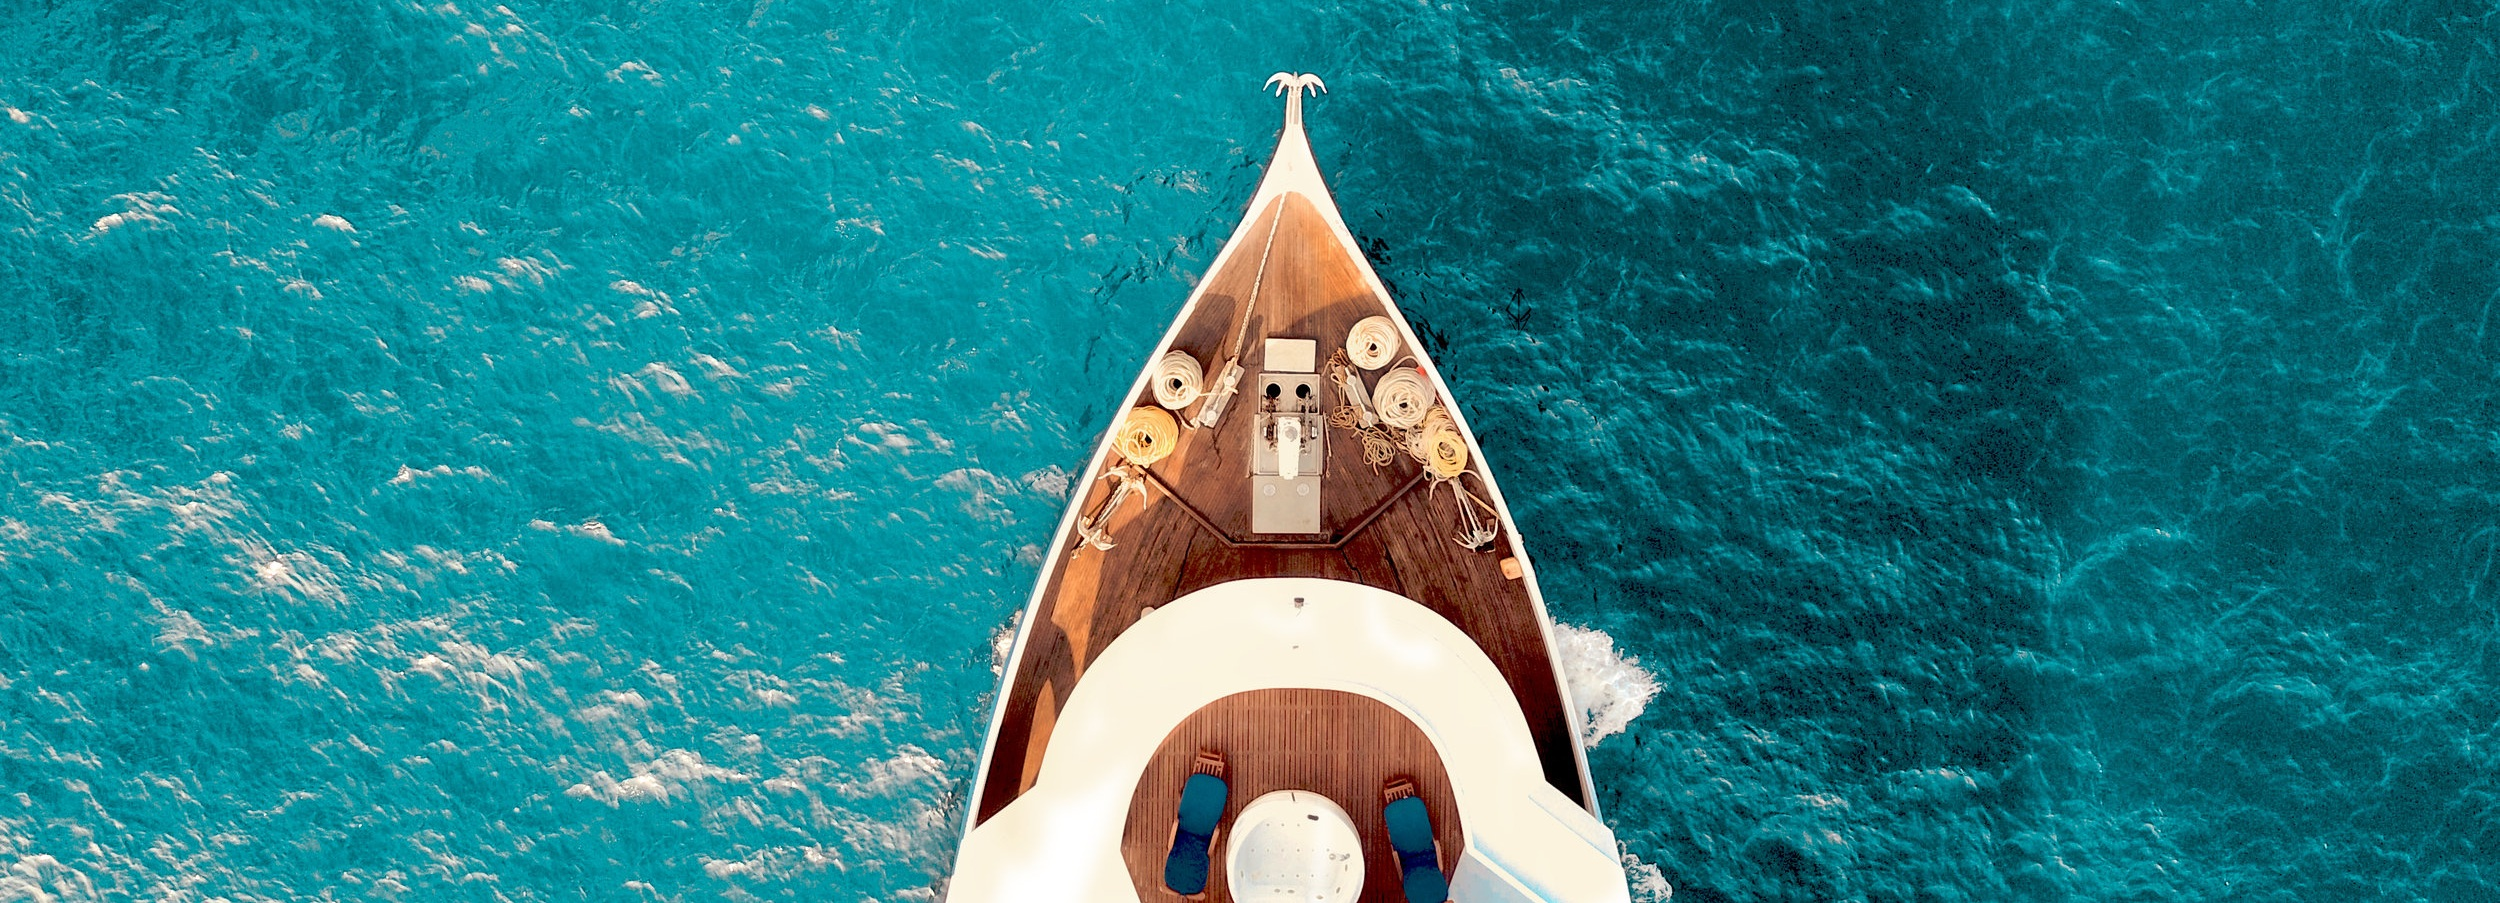 Yacht Insurance Marine Insurance House Ship Bow